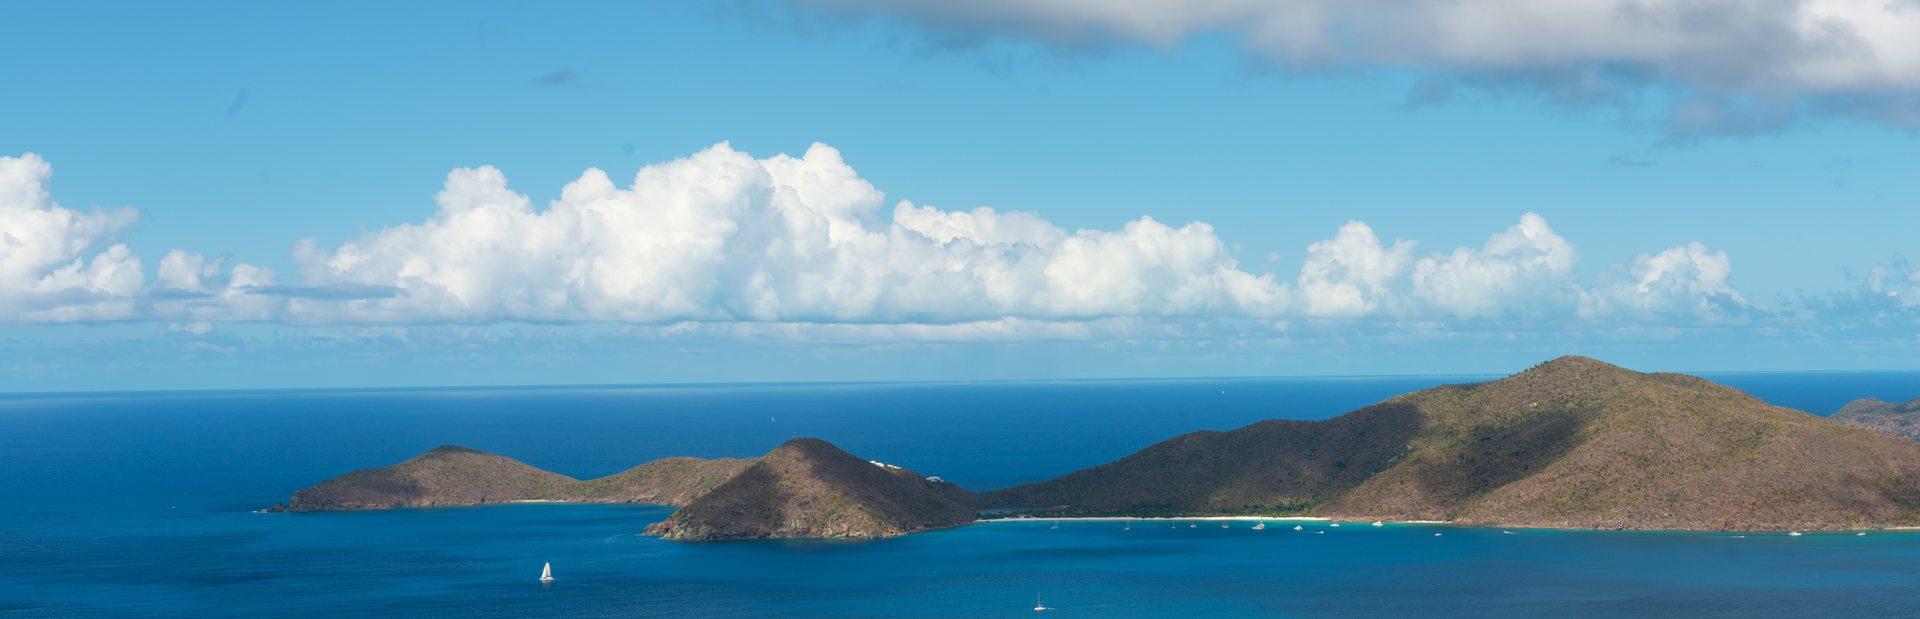 Cooper Island guide